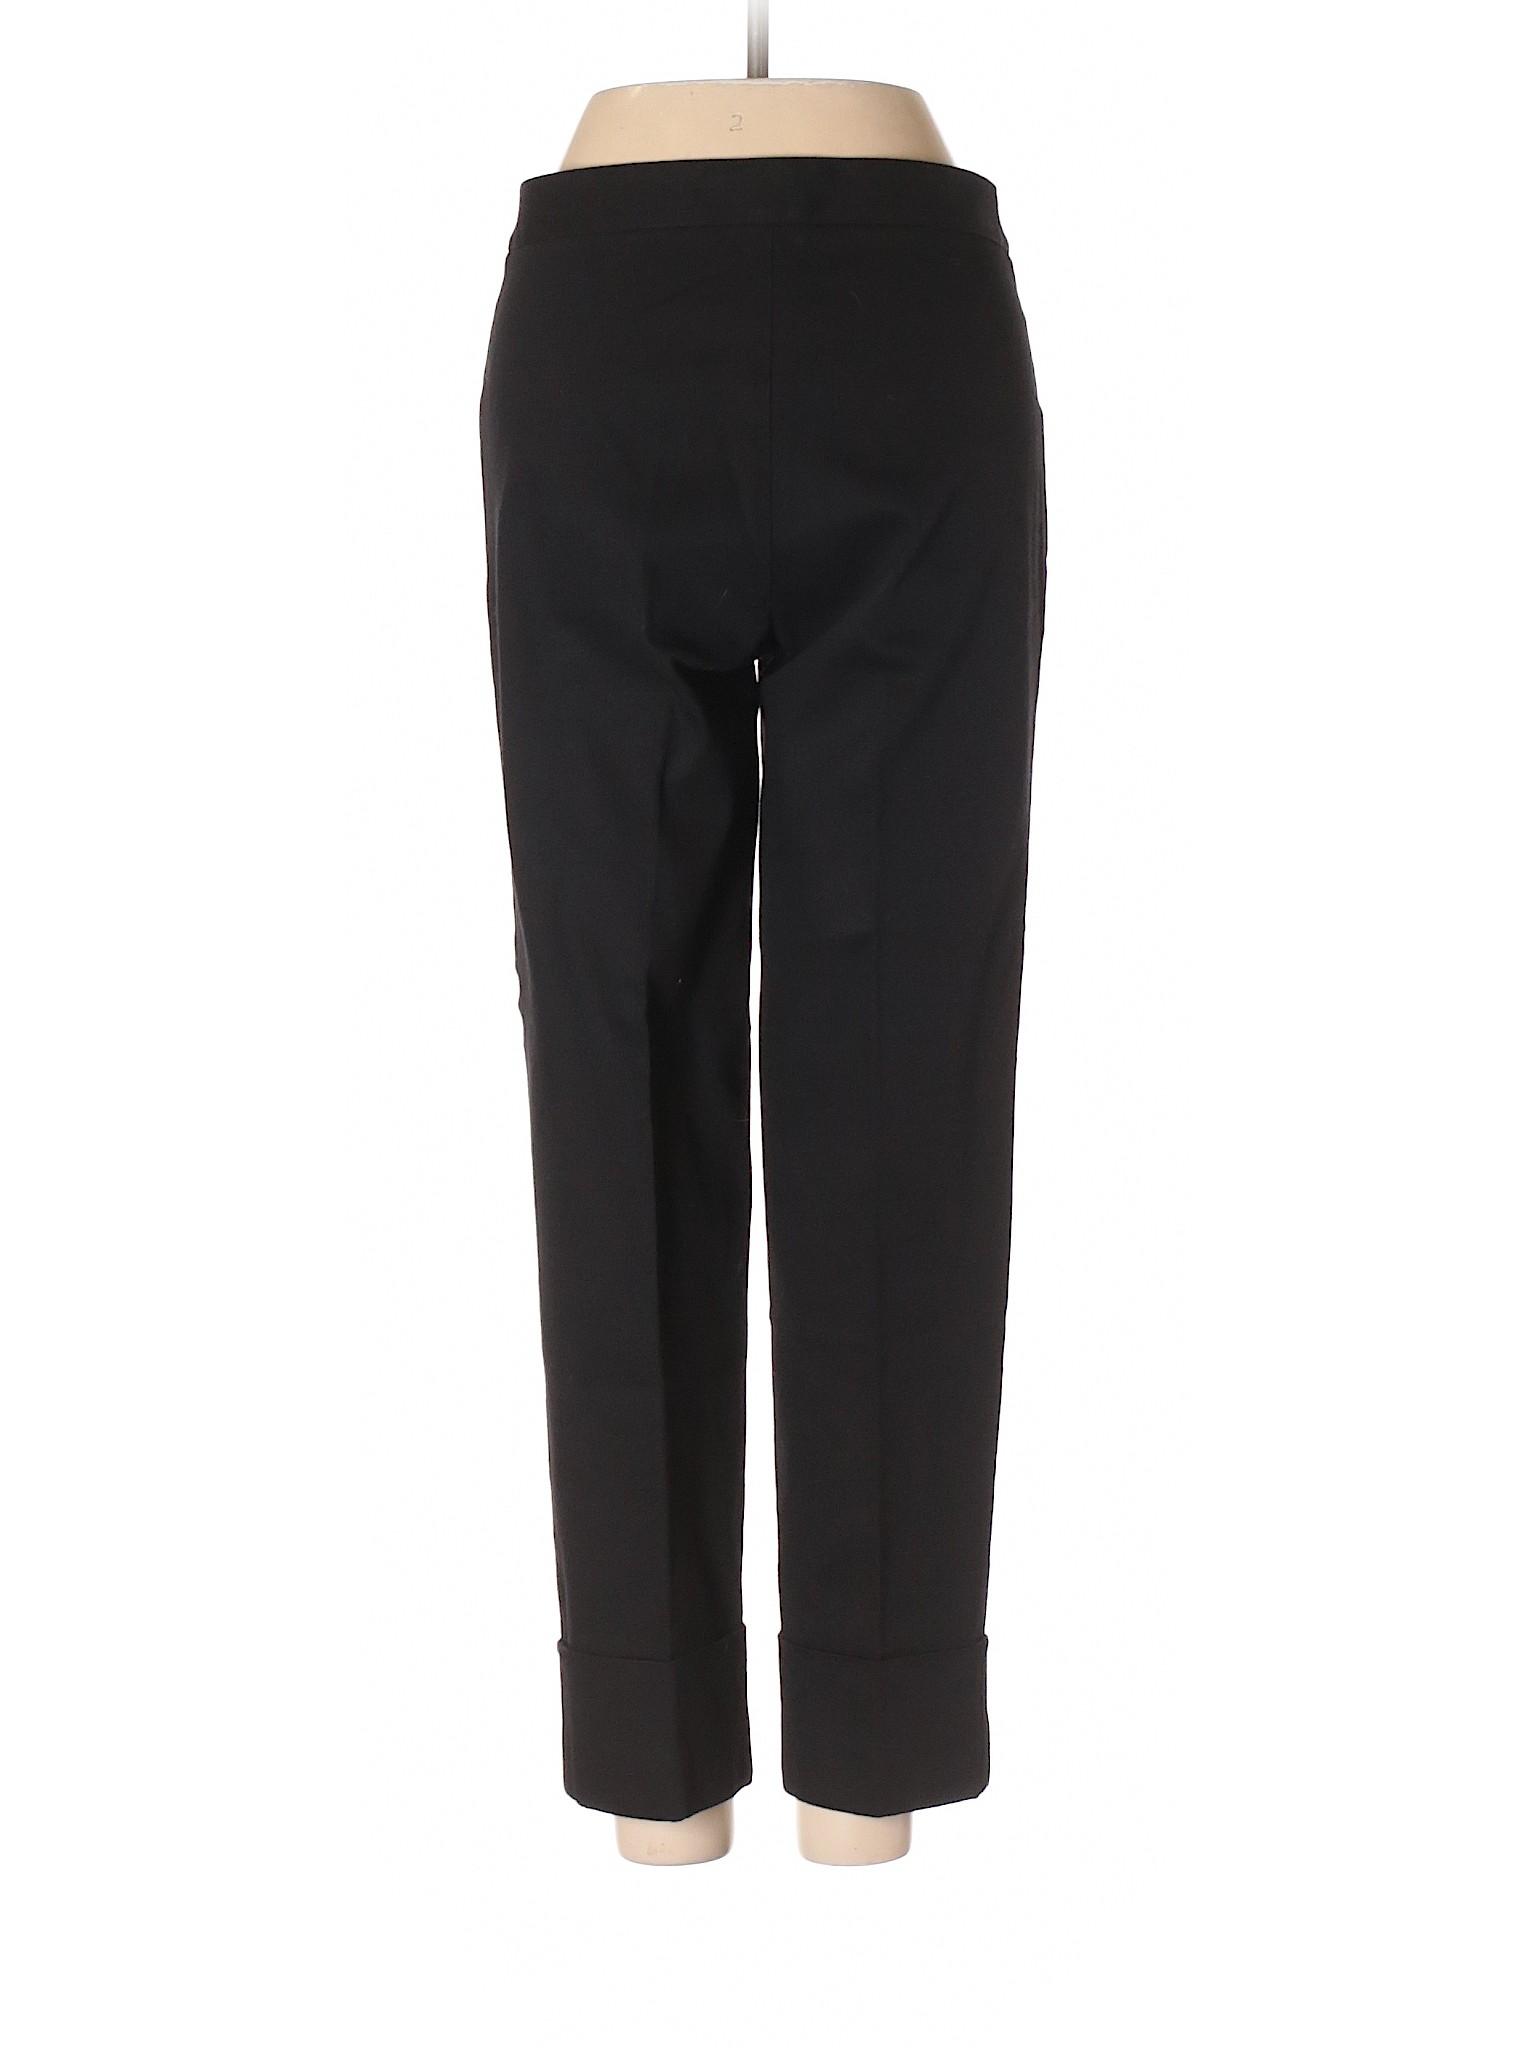 Casual Pants Gracie amp; leisure Boutique Hanna AOSw8q6HcI